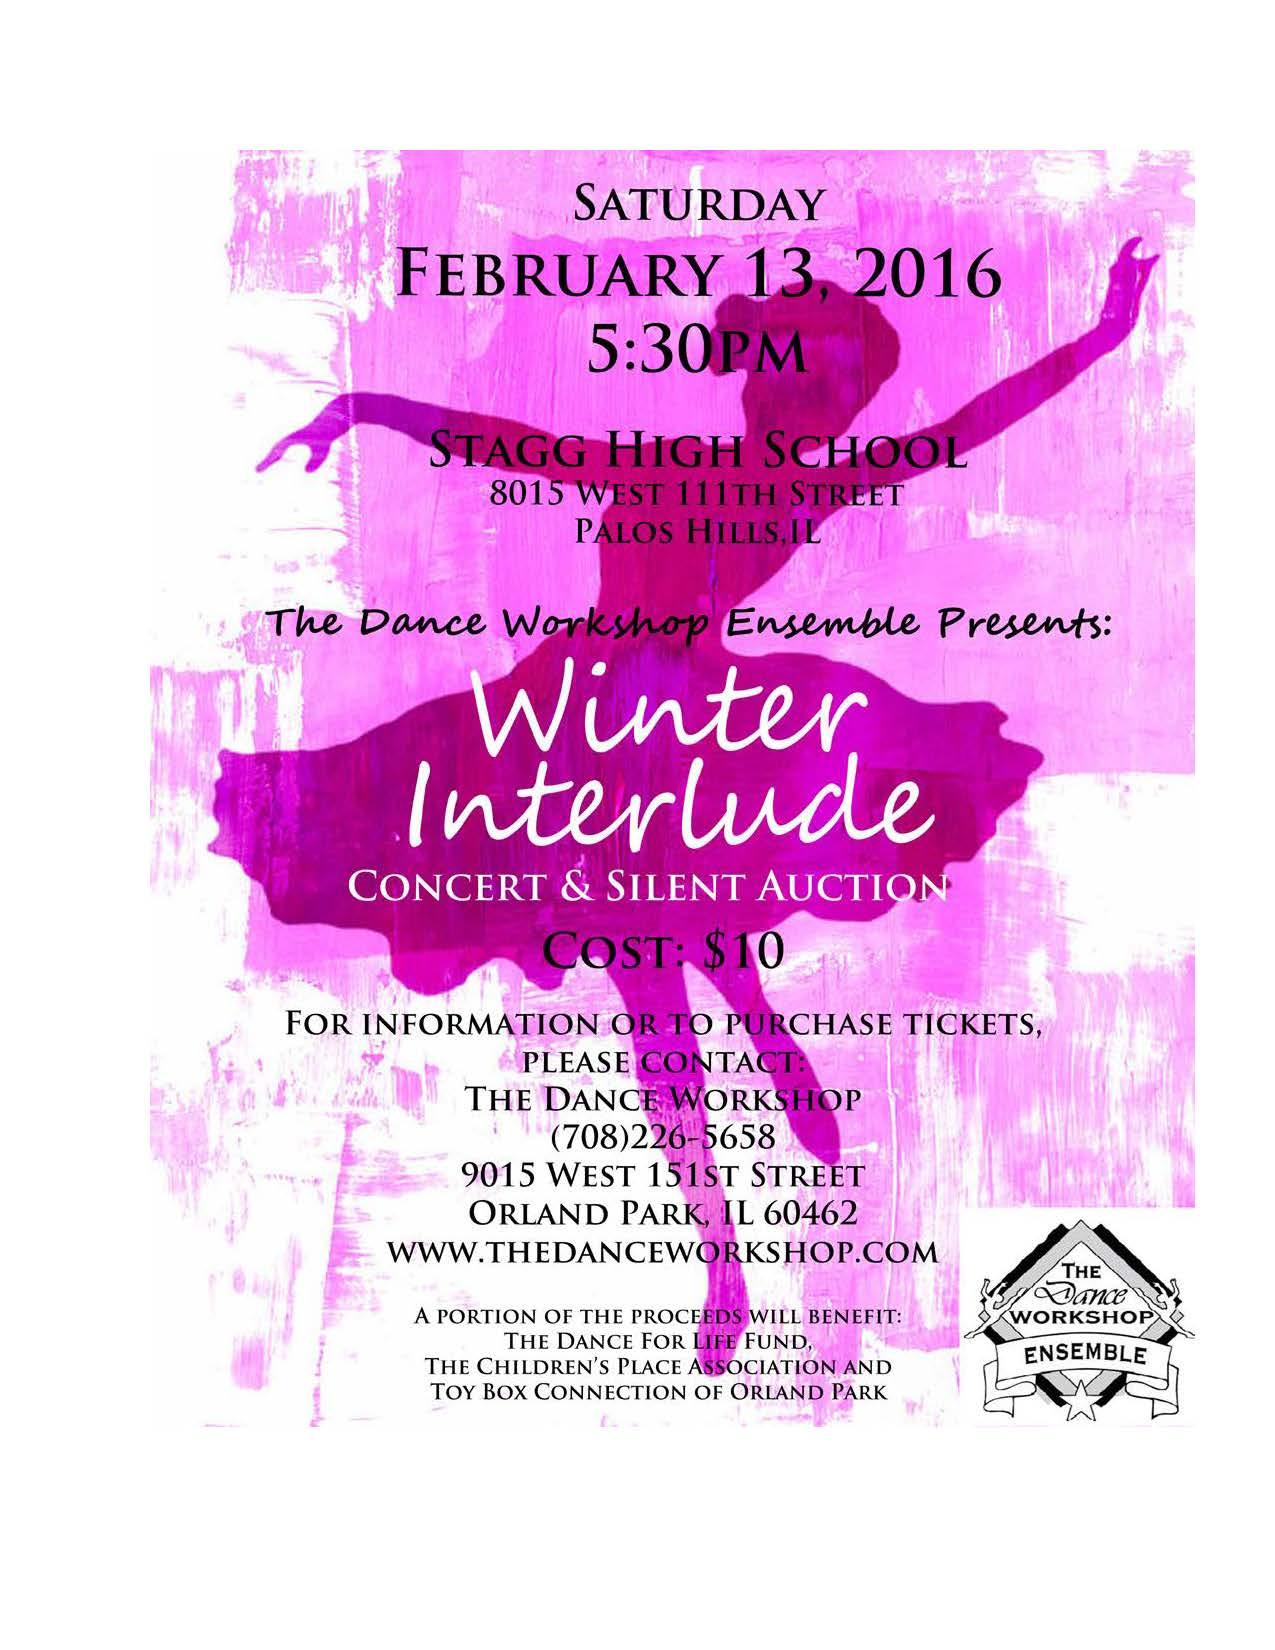 winter interlude flyer 2016